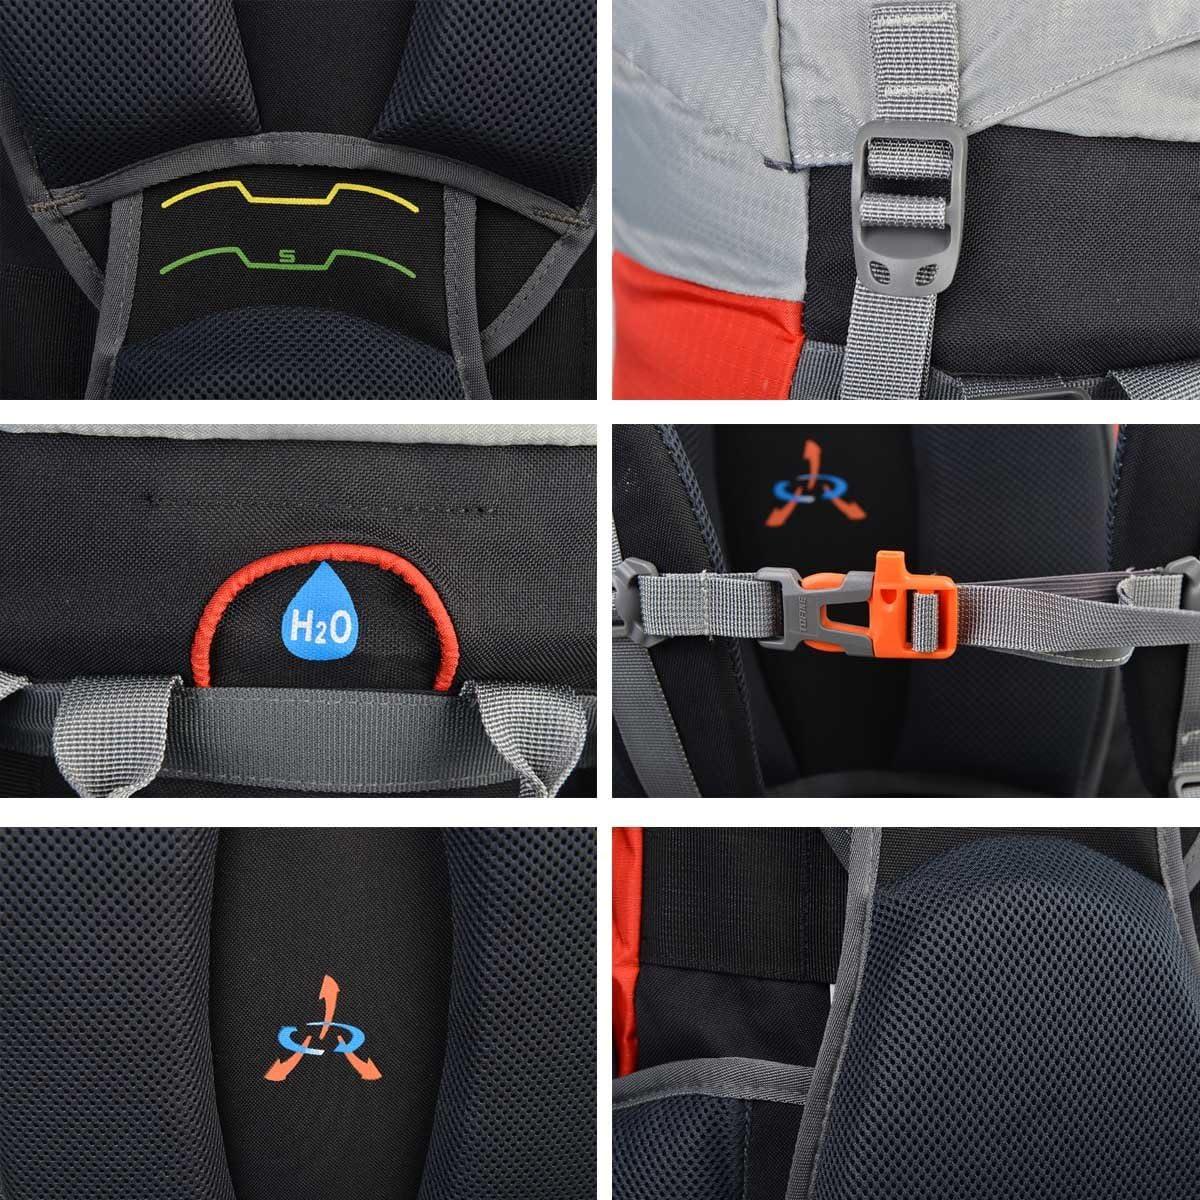 TOFINE External-Frame-Backpacks Rain Cover Waterproof Nylon 45L55L65L Hiking Camping Mountaineering Bag